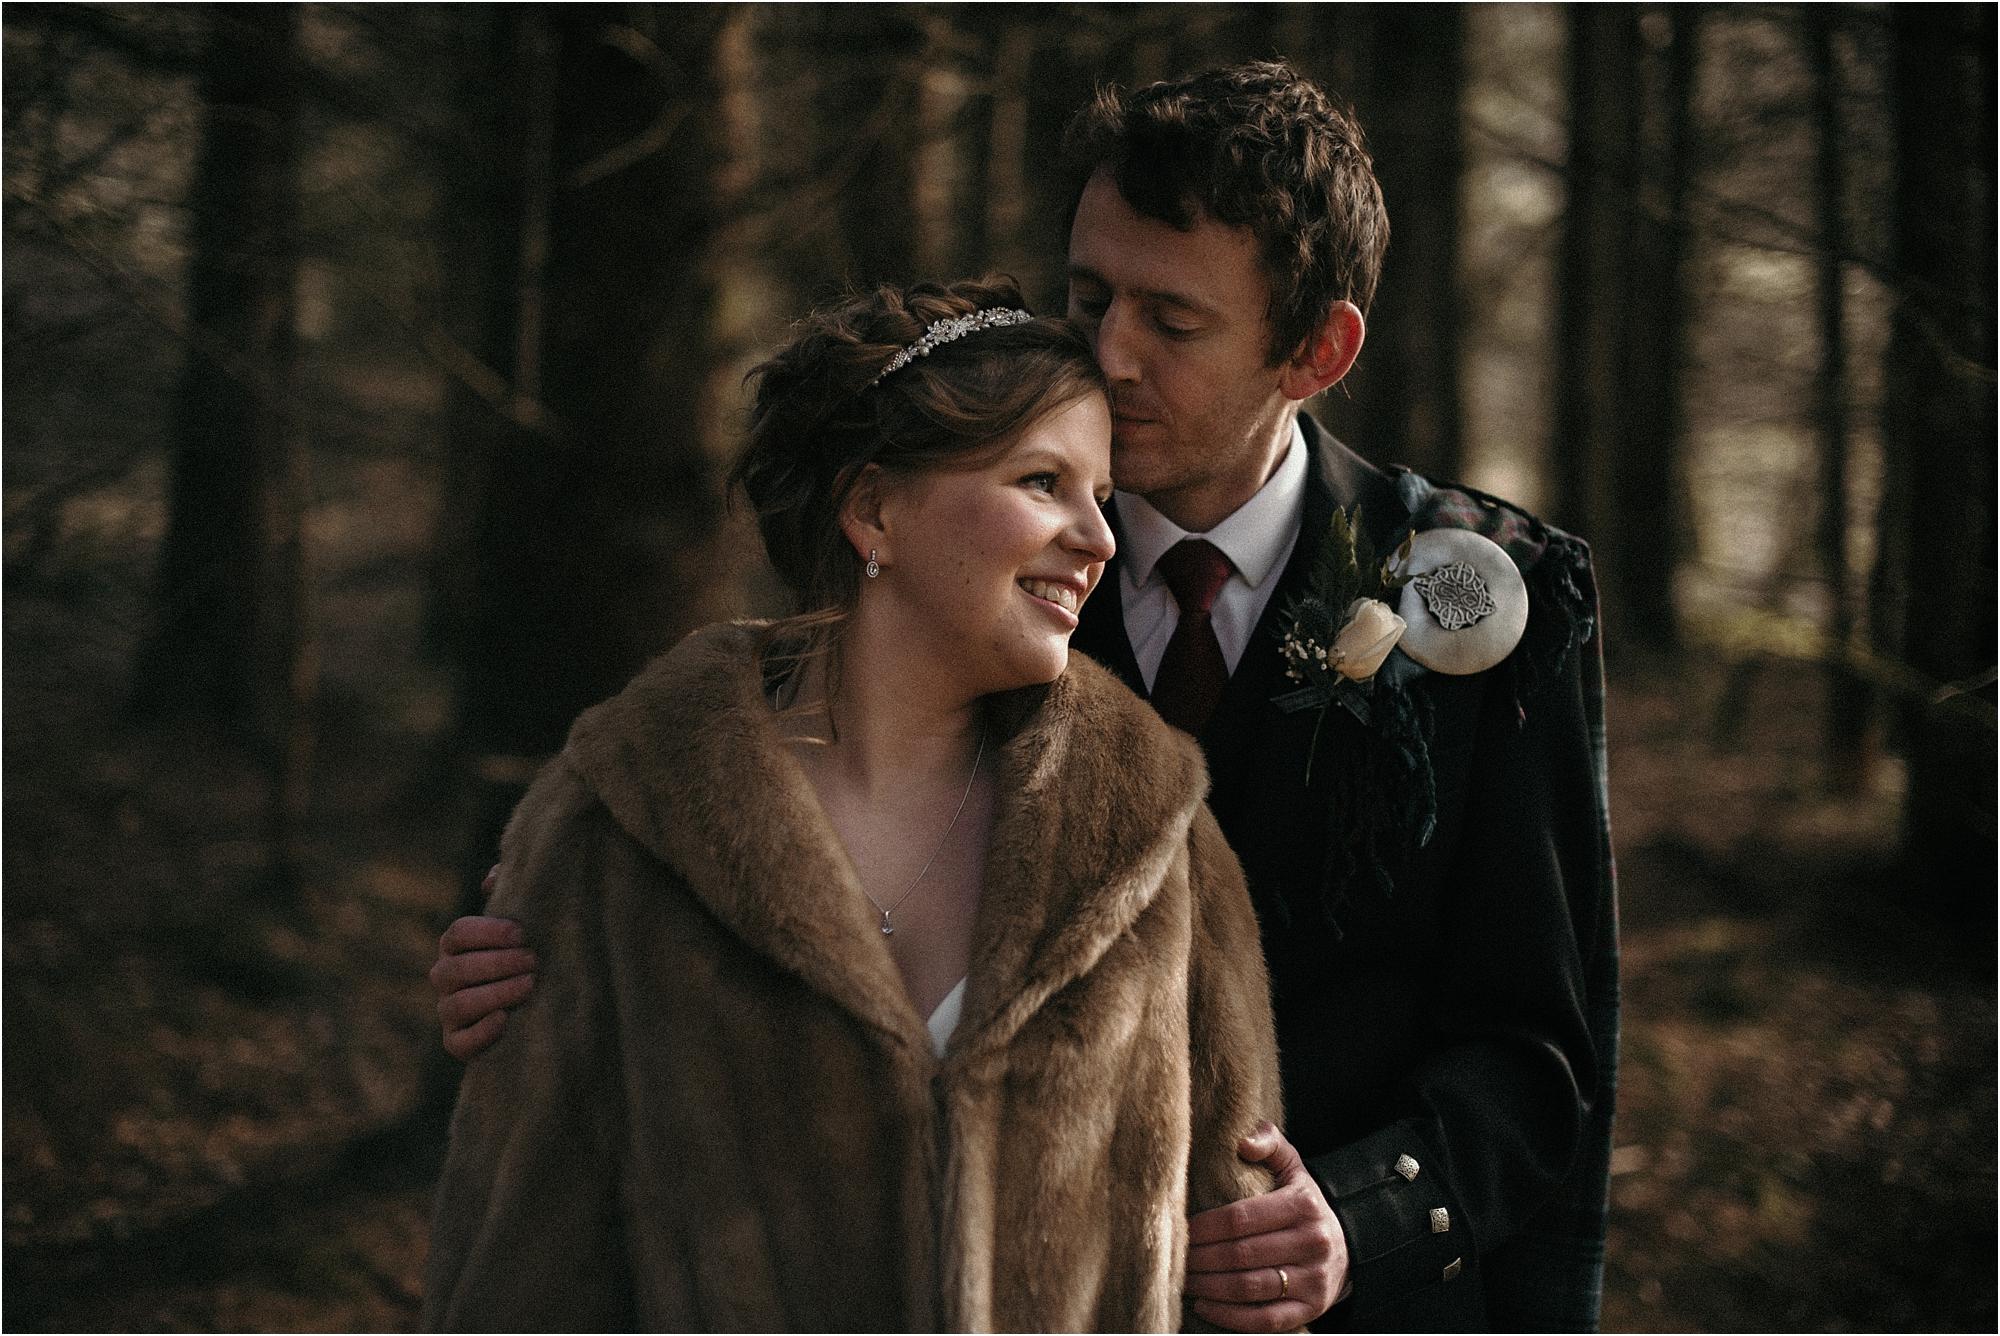 Kinlochard-village-hall-scottish-wedding-claire-fleck-photography__0052.jpg